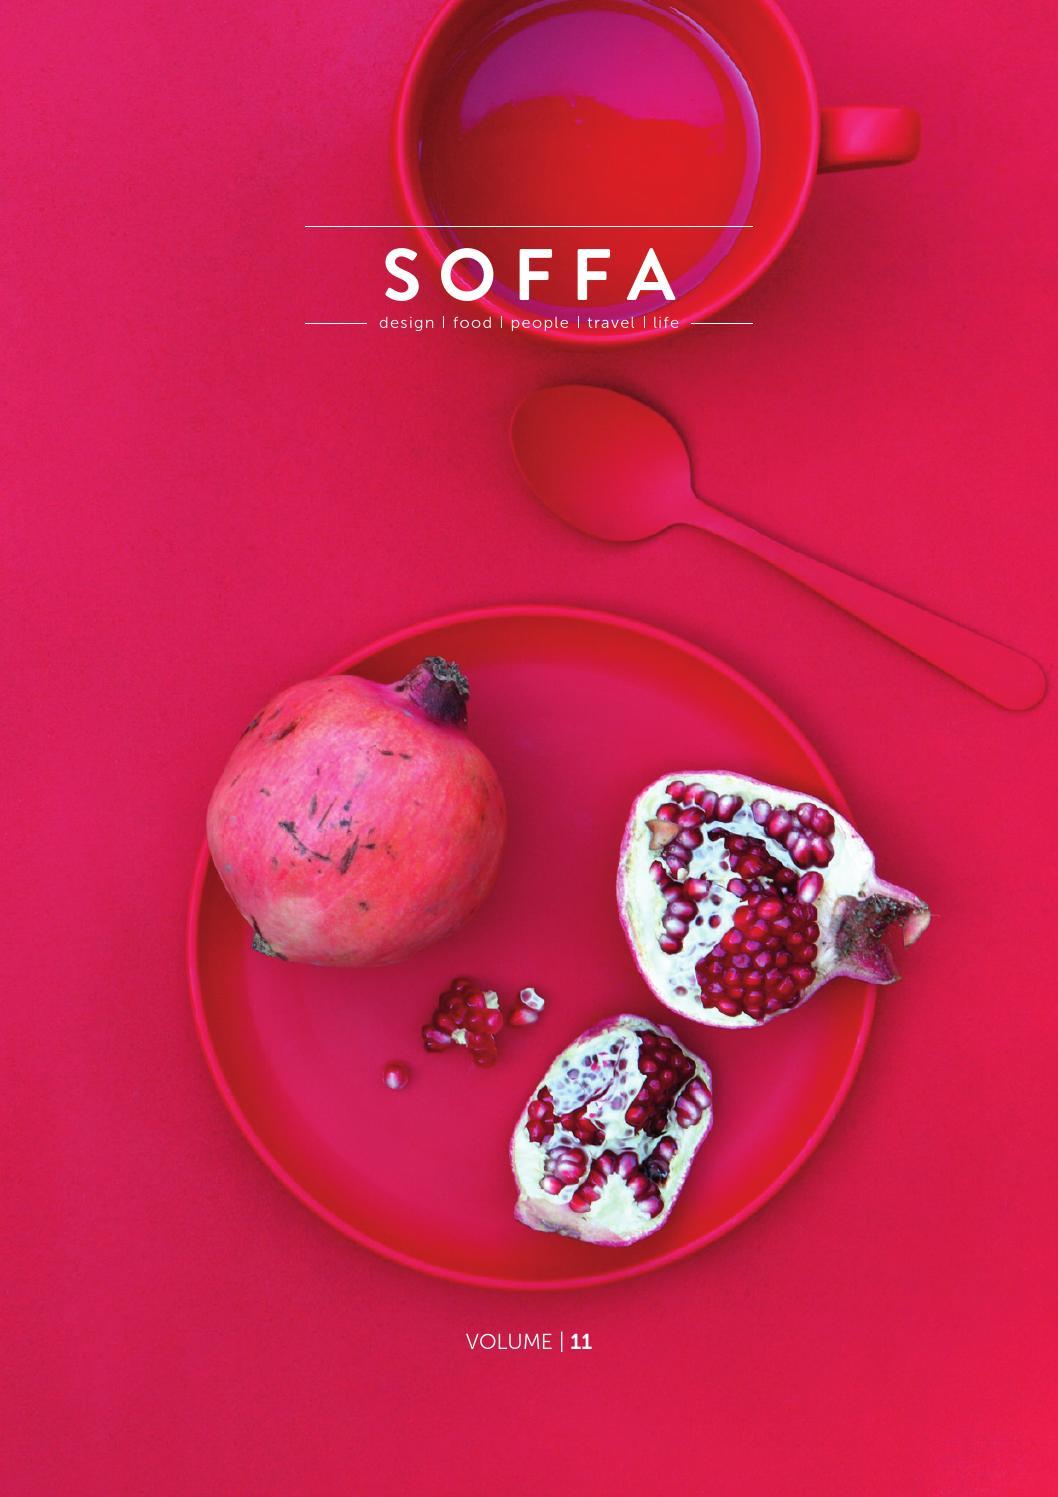 soffa magazine ~ soffa magazine 11 teaser  design travel food people home